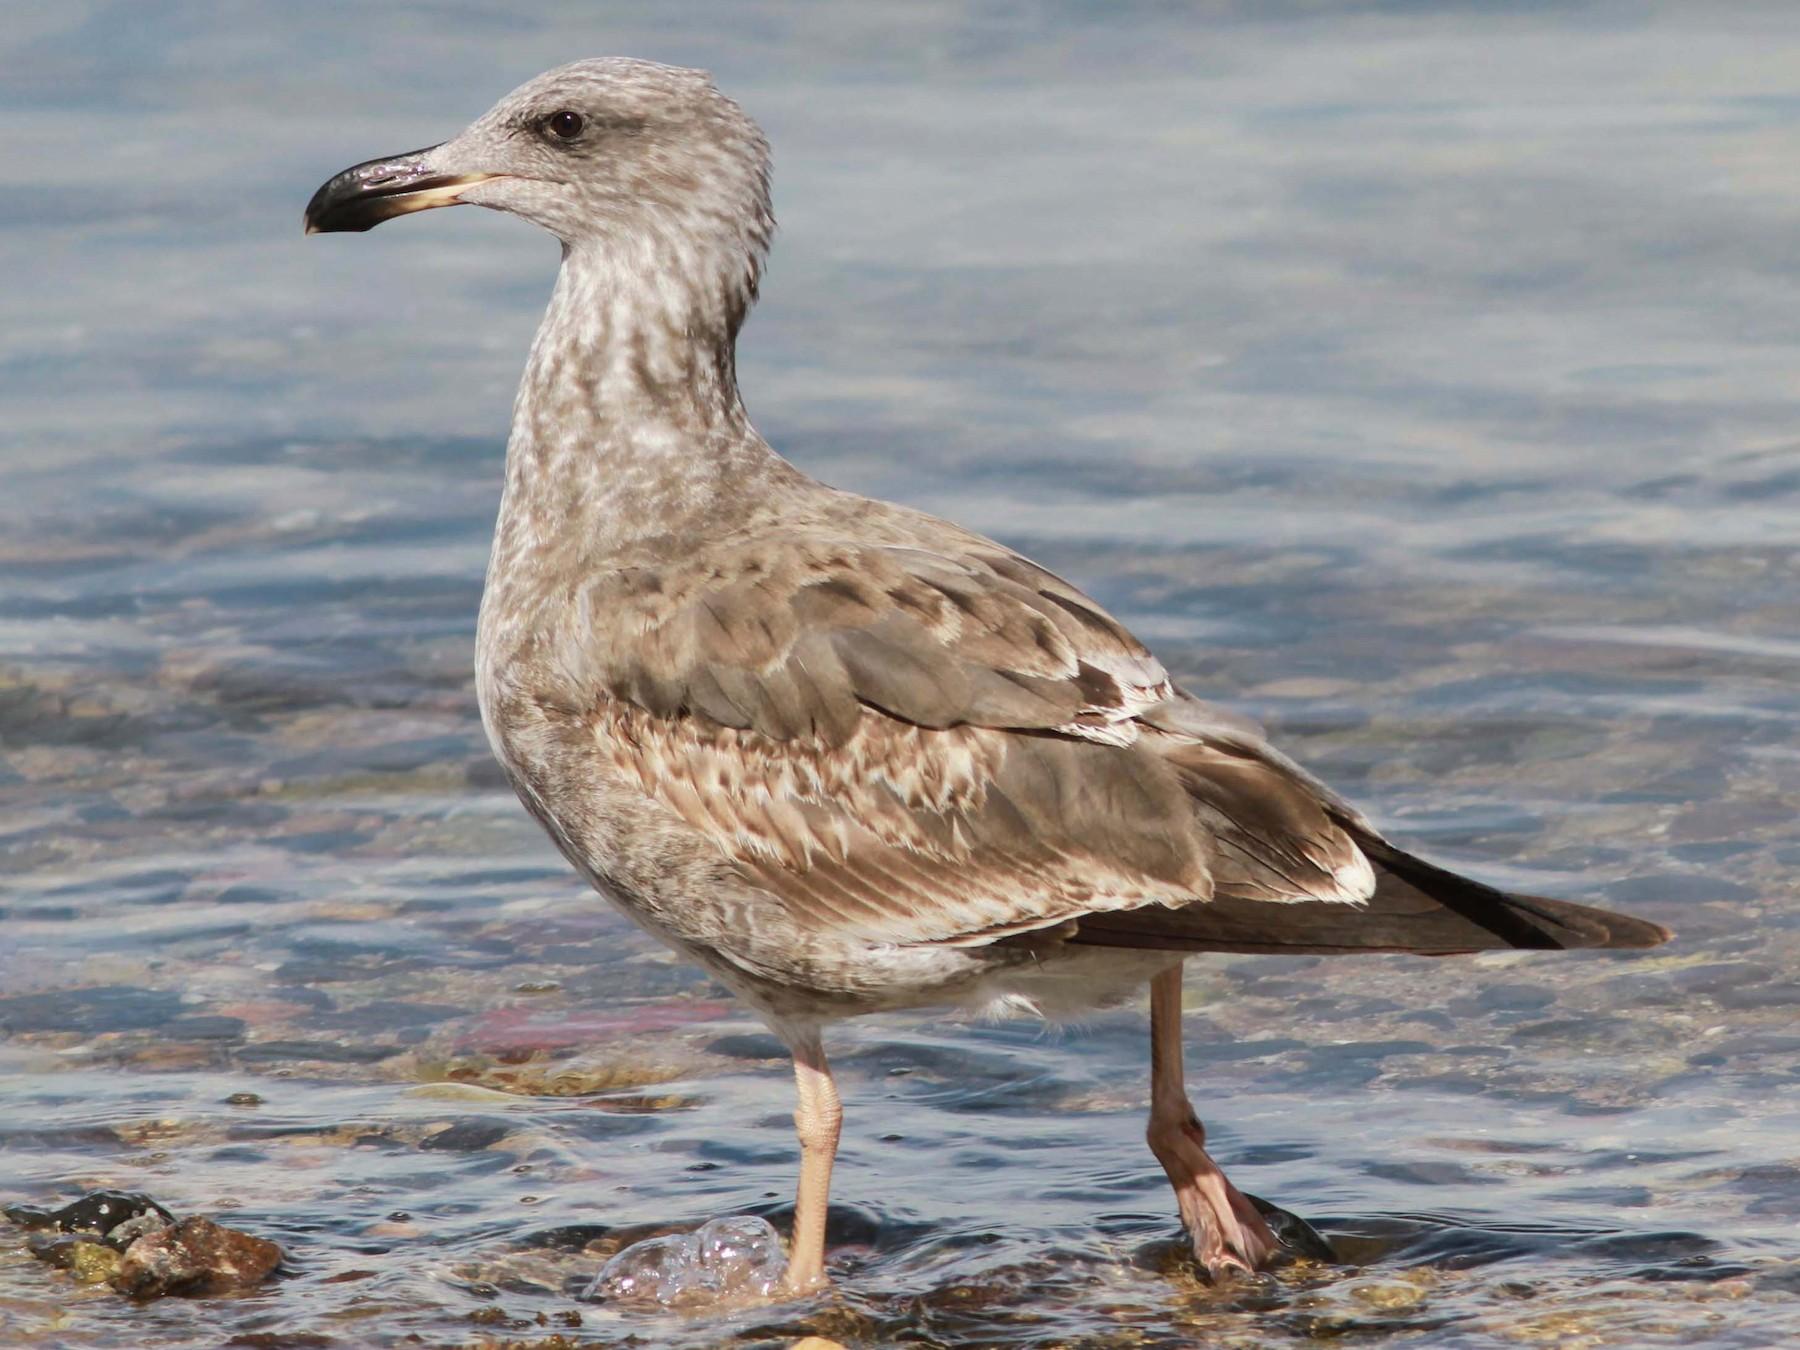 Yellow-footed Gull - David Vander Pluym